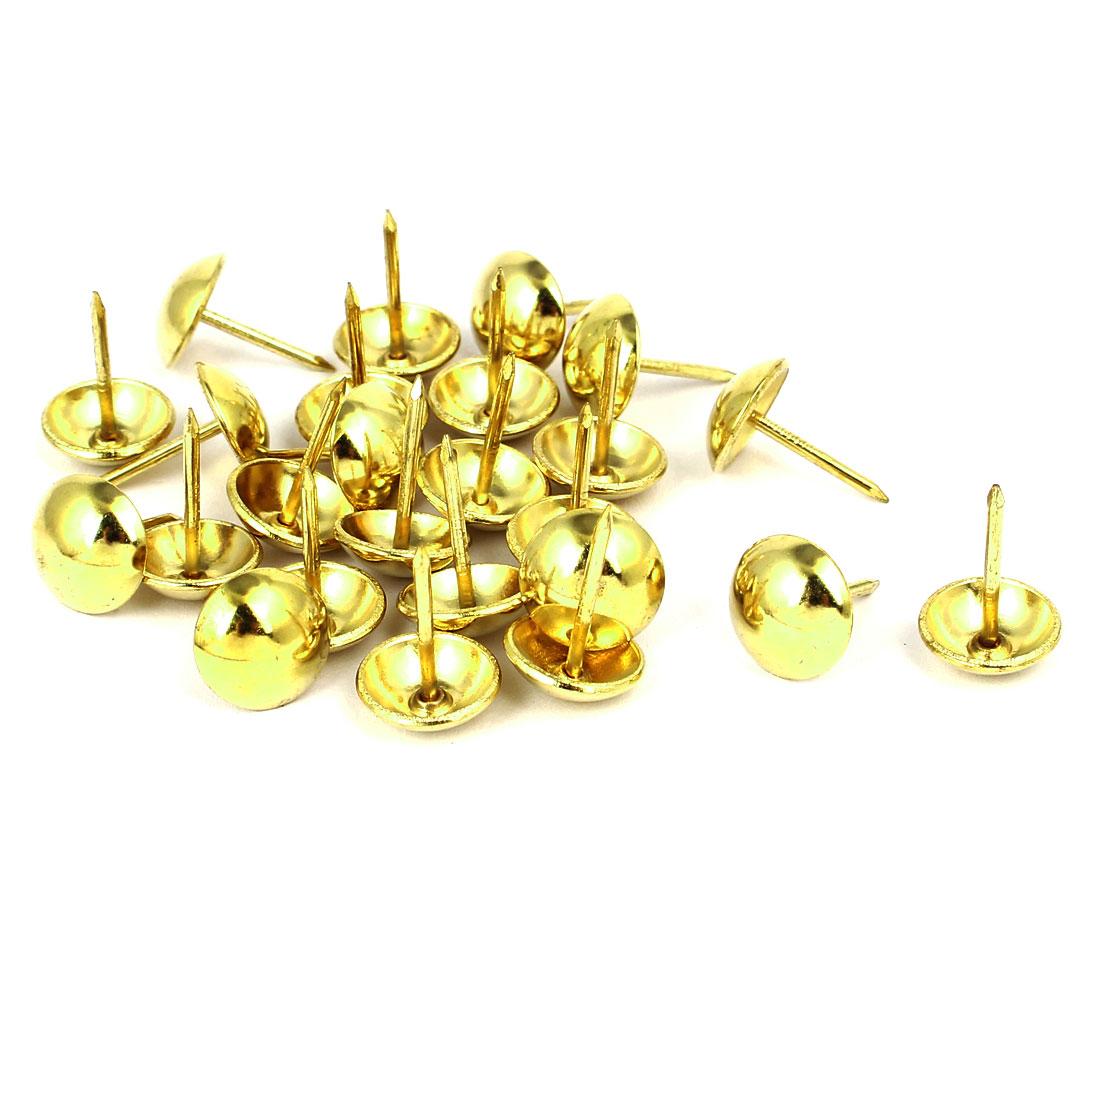 Home Furniture Upholstery Thumb Tack Nail Push Pin Gold Tone 12mm x 17mm 25pcs